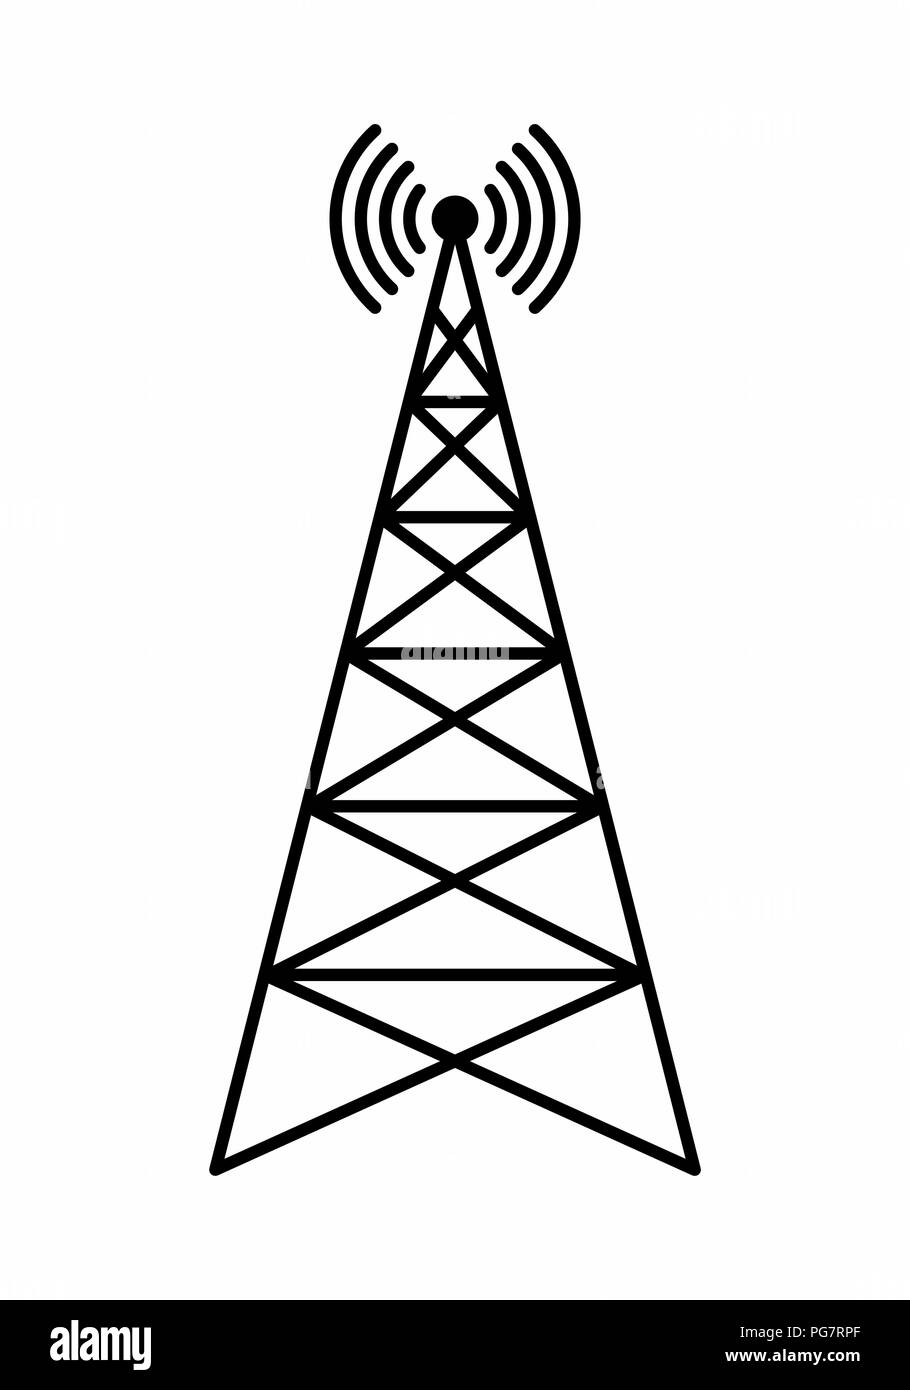 Illustration of a communication tower isolated on white background - Stock Image